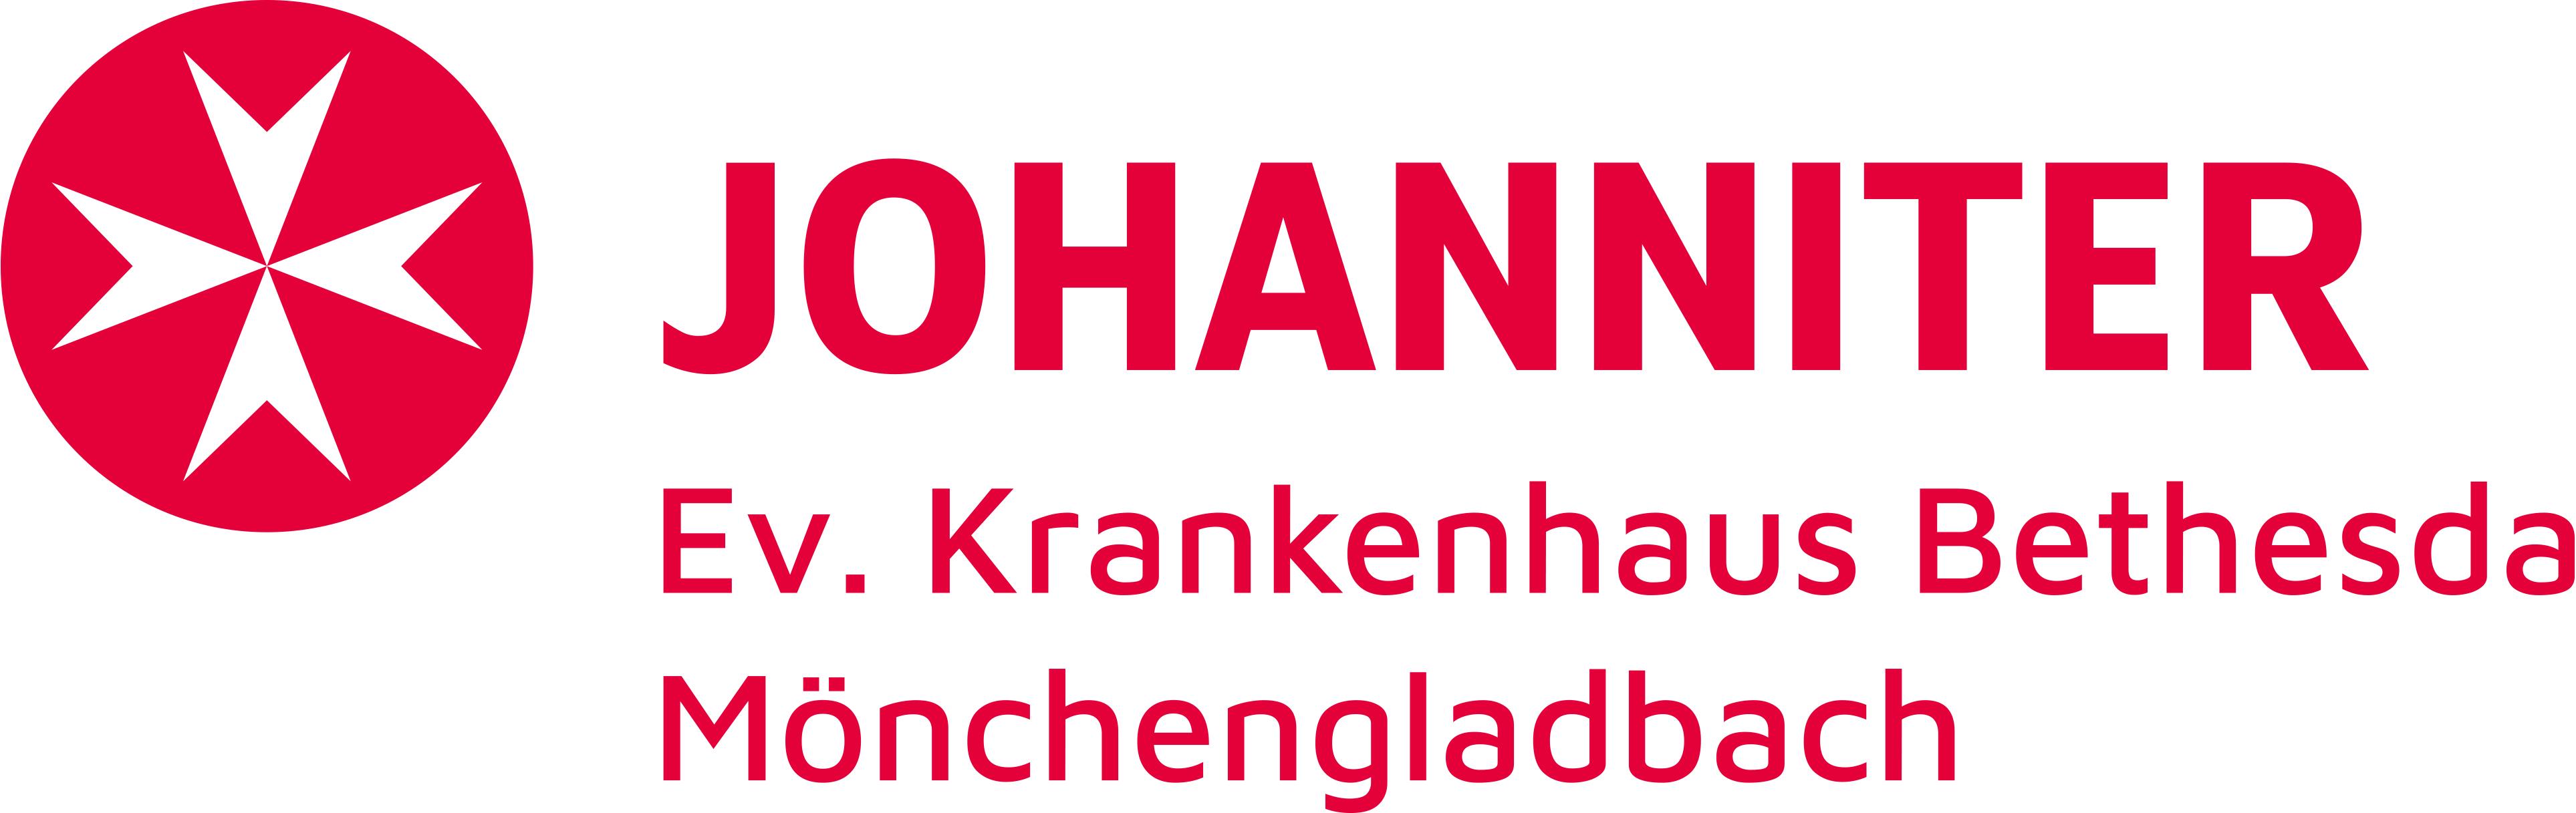 Johanniter GmbH - Ev. Krankenhaus Bethesda Mönchengladbach